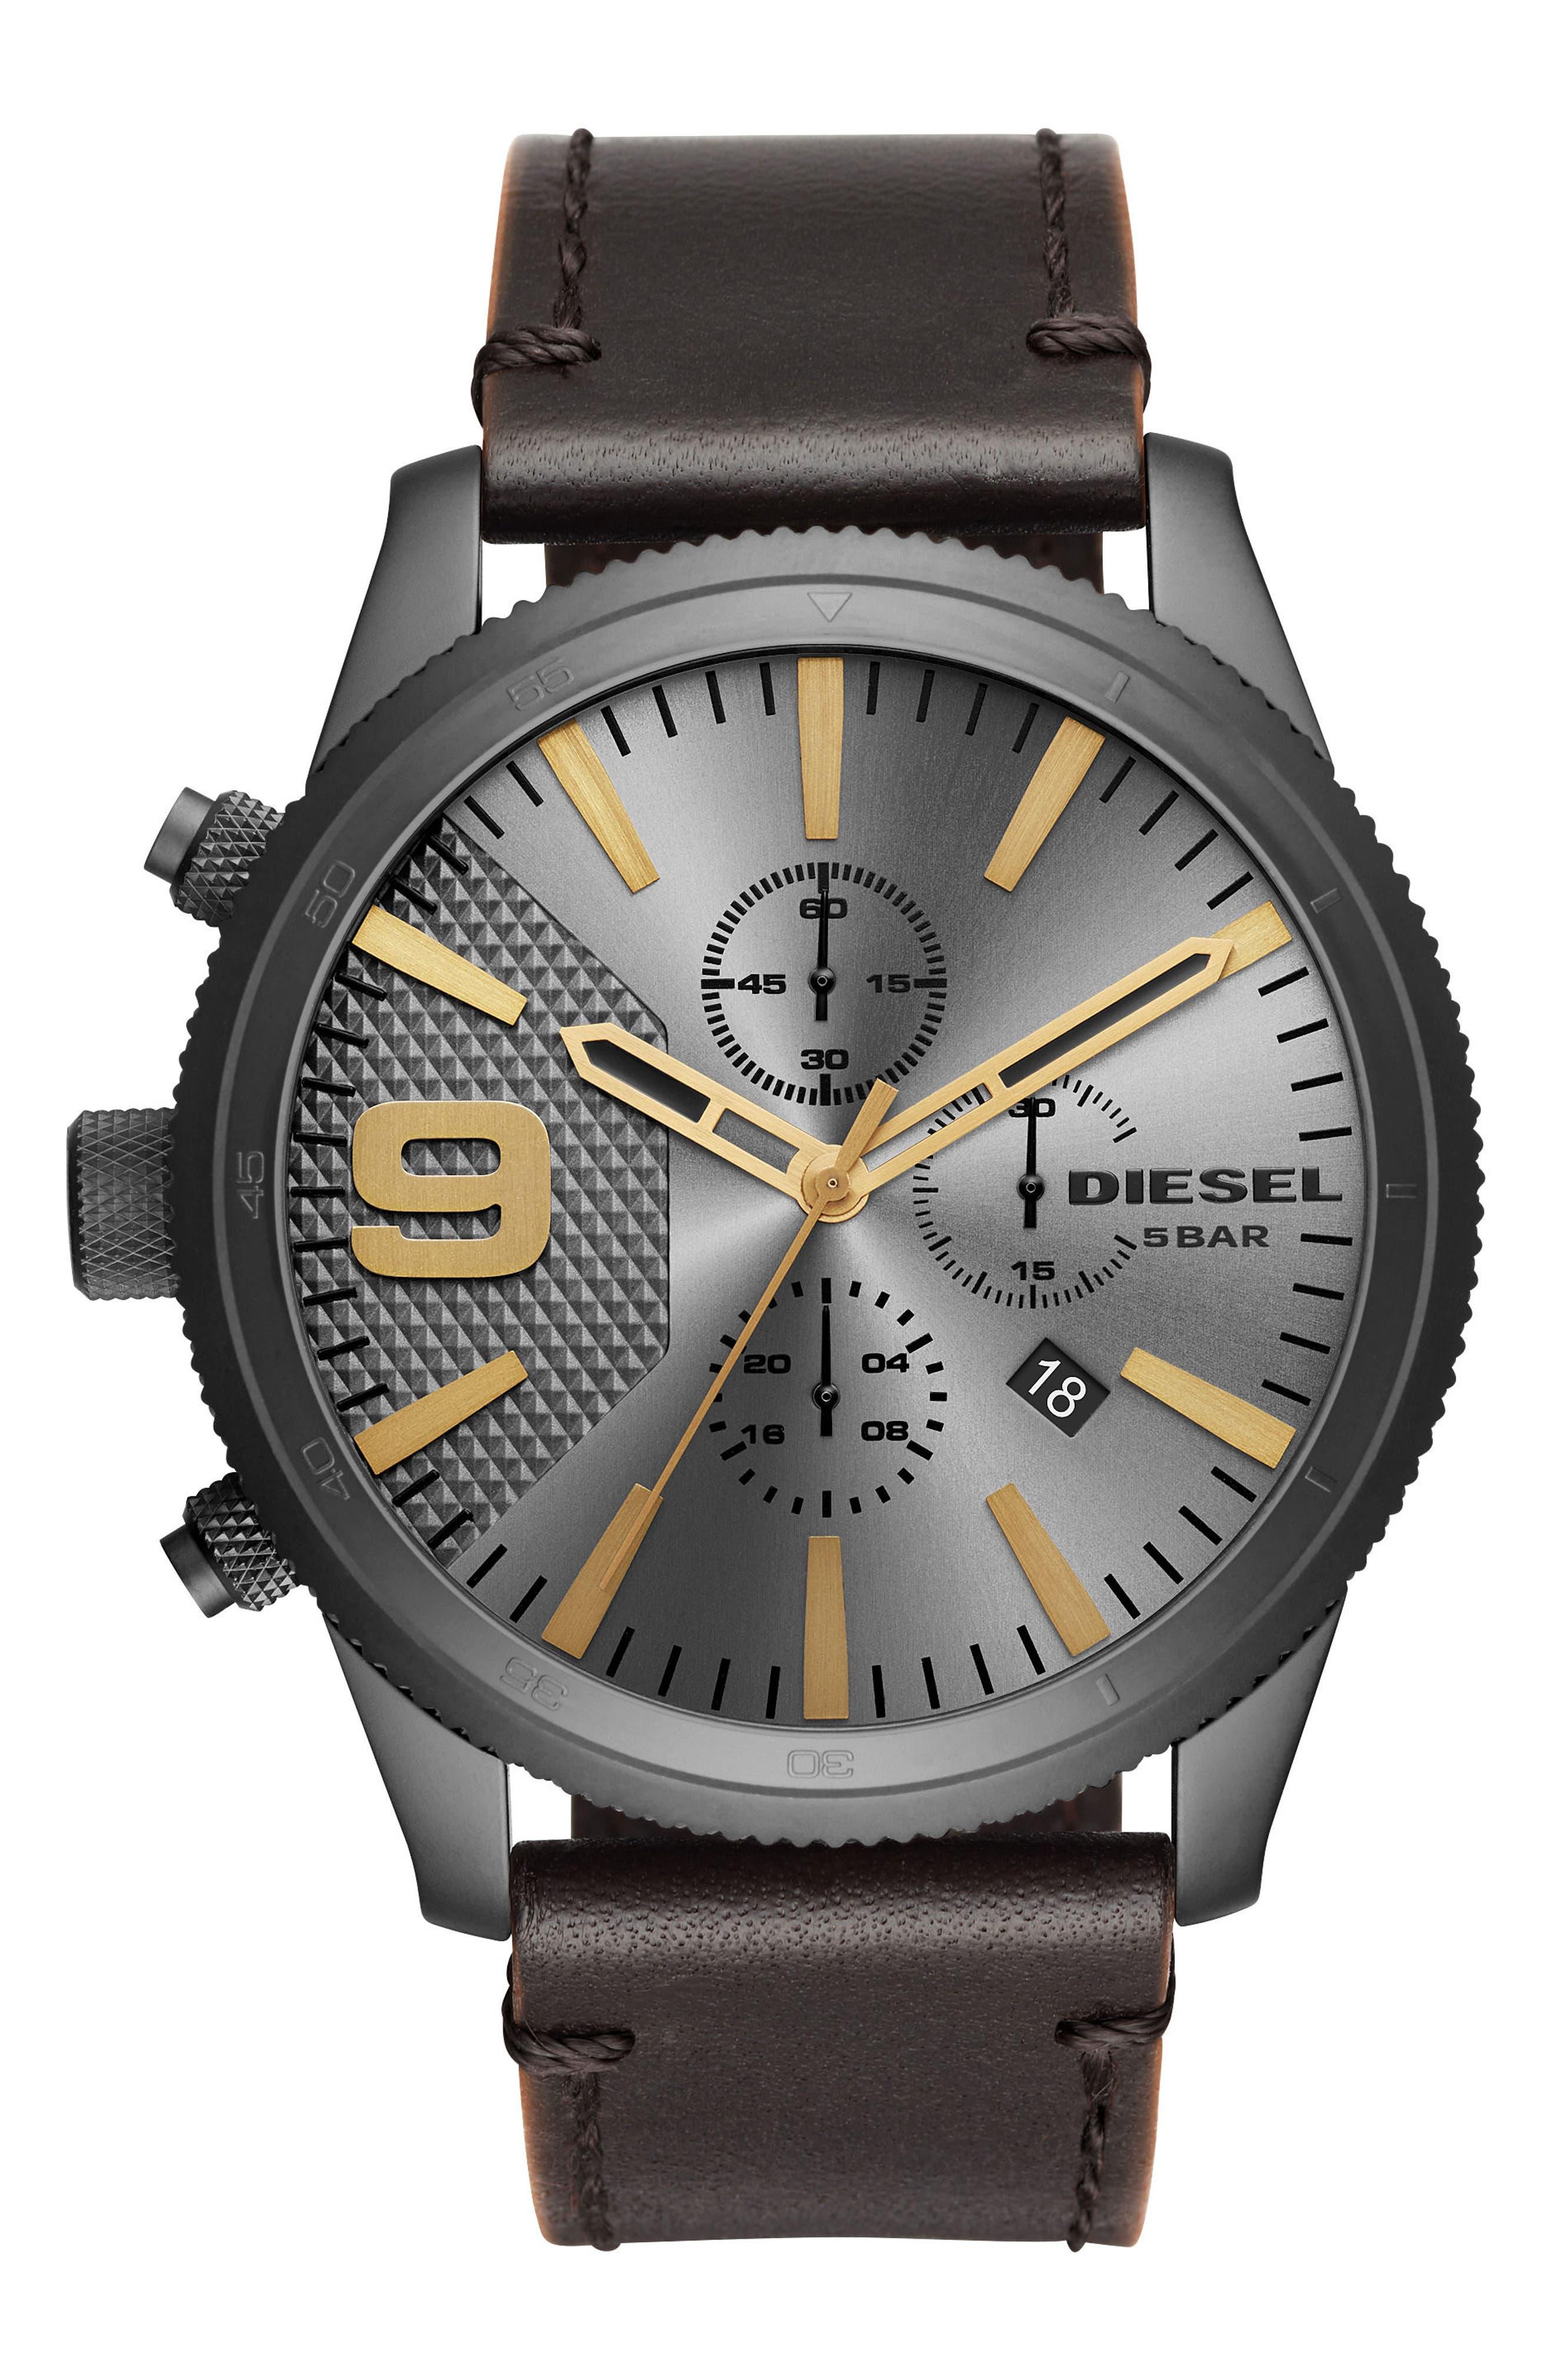 DIESEL® Rasp Chronograph Leather Strap Watch, 50mm x 59mm